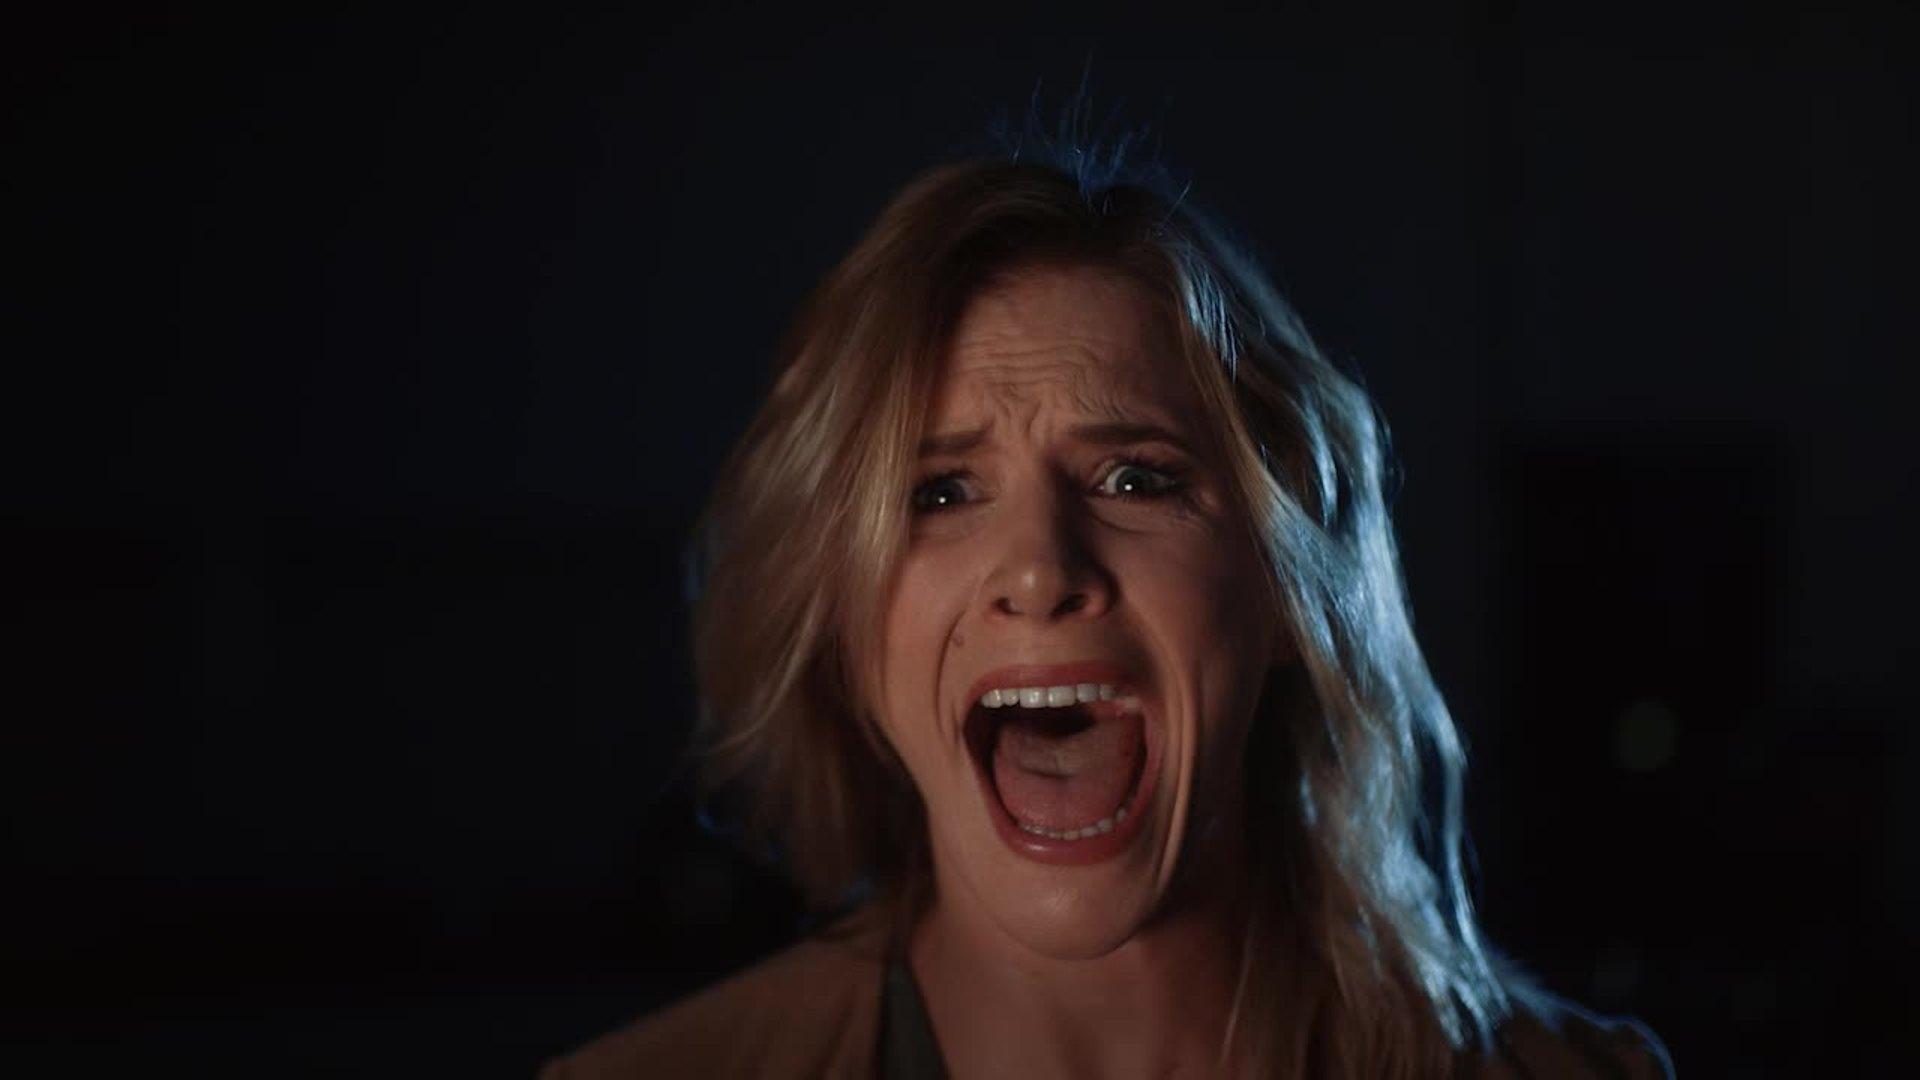 Audi A6 Filmwettbewerb: Horror House